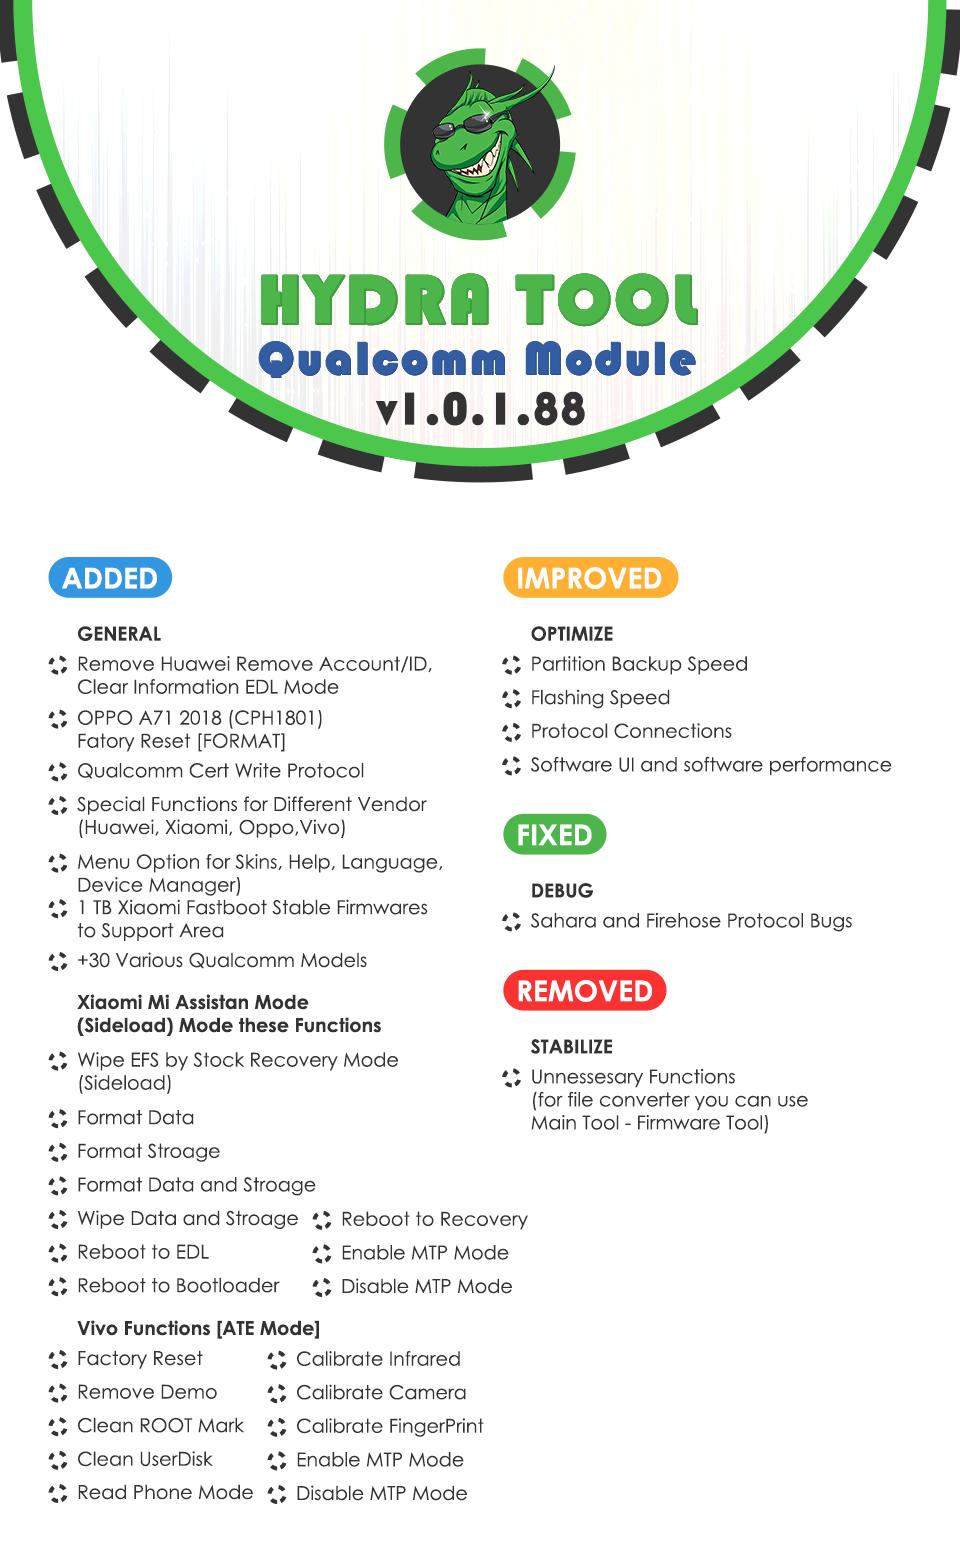 Hydra Qualcomm Tool v1.0.1.88 [14.05.2019] - Xiaomi, Huawei, Vivo and More